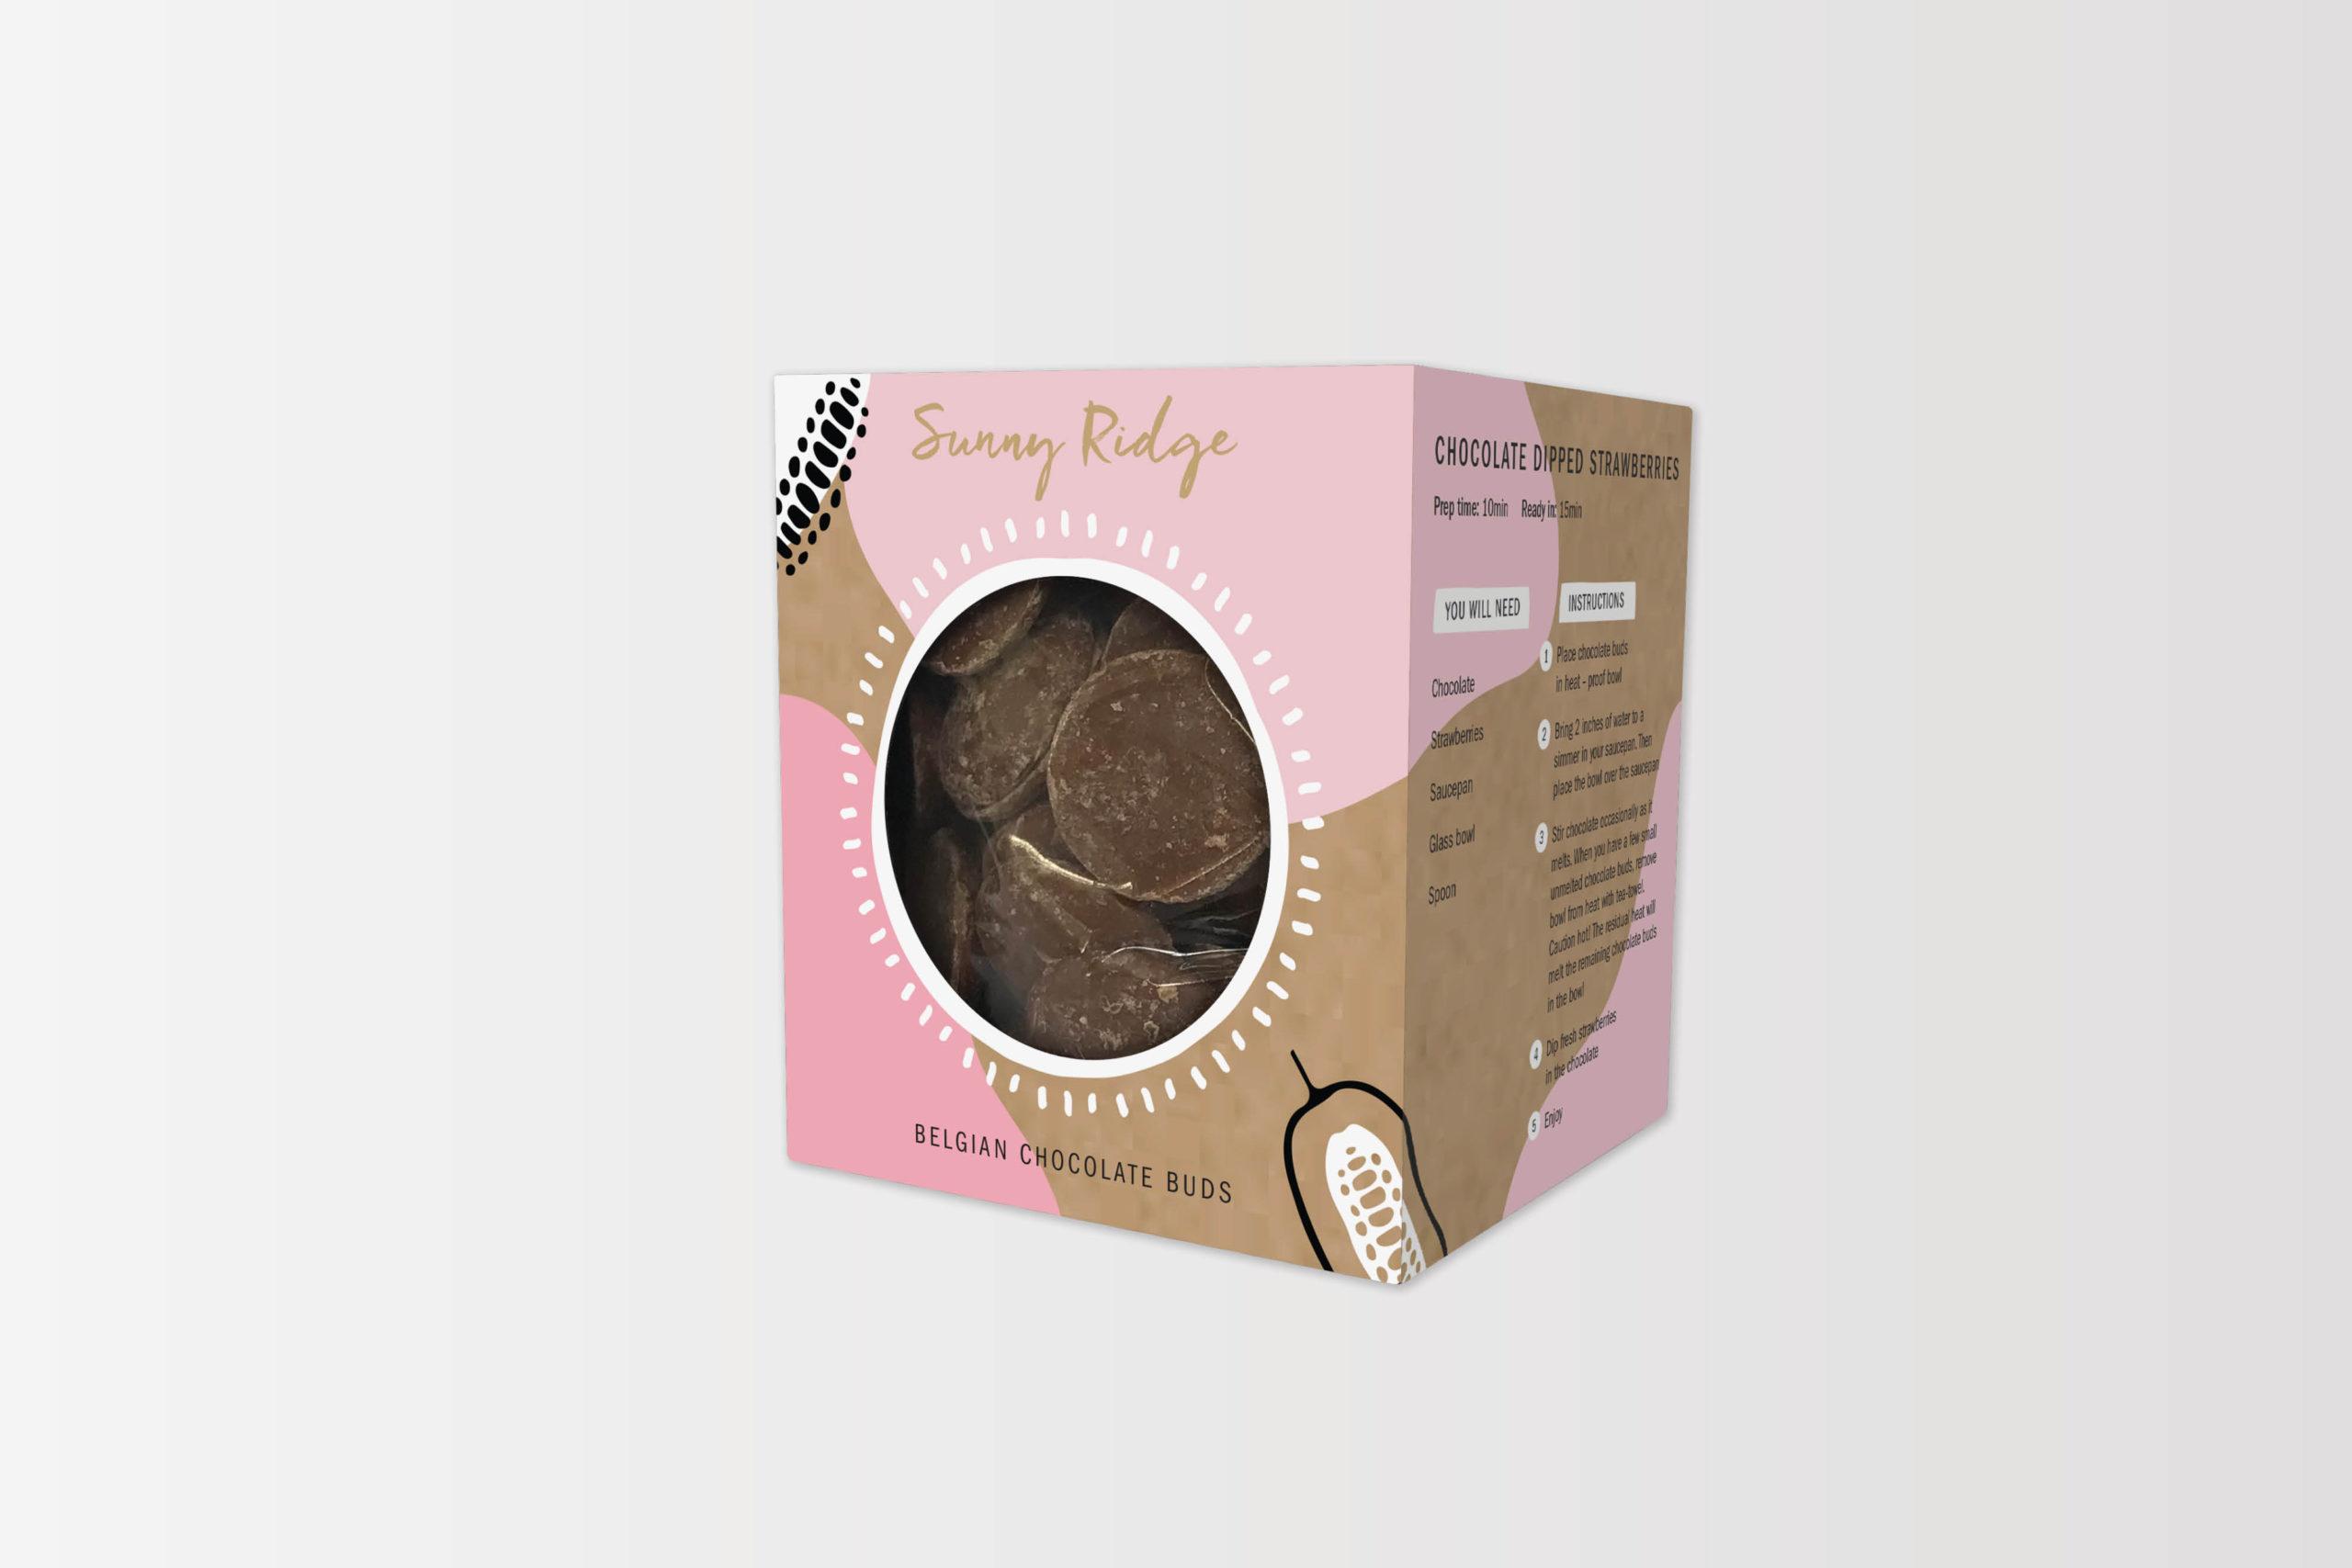 Sunny Ridge Packaging